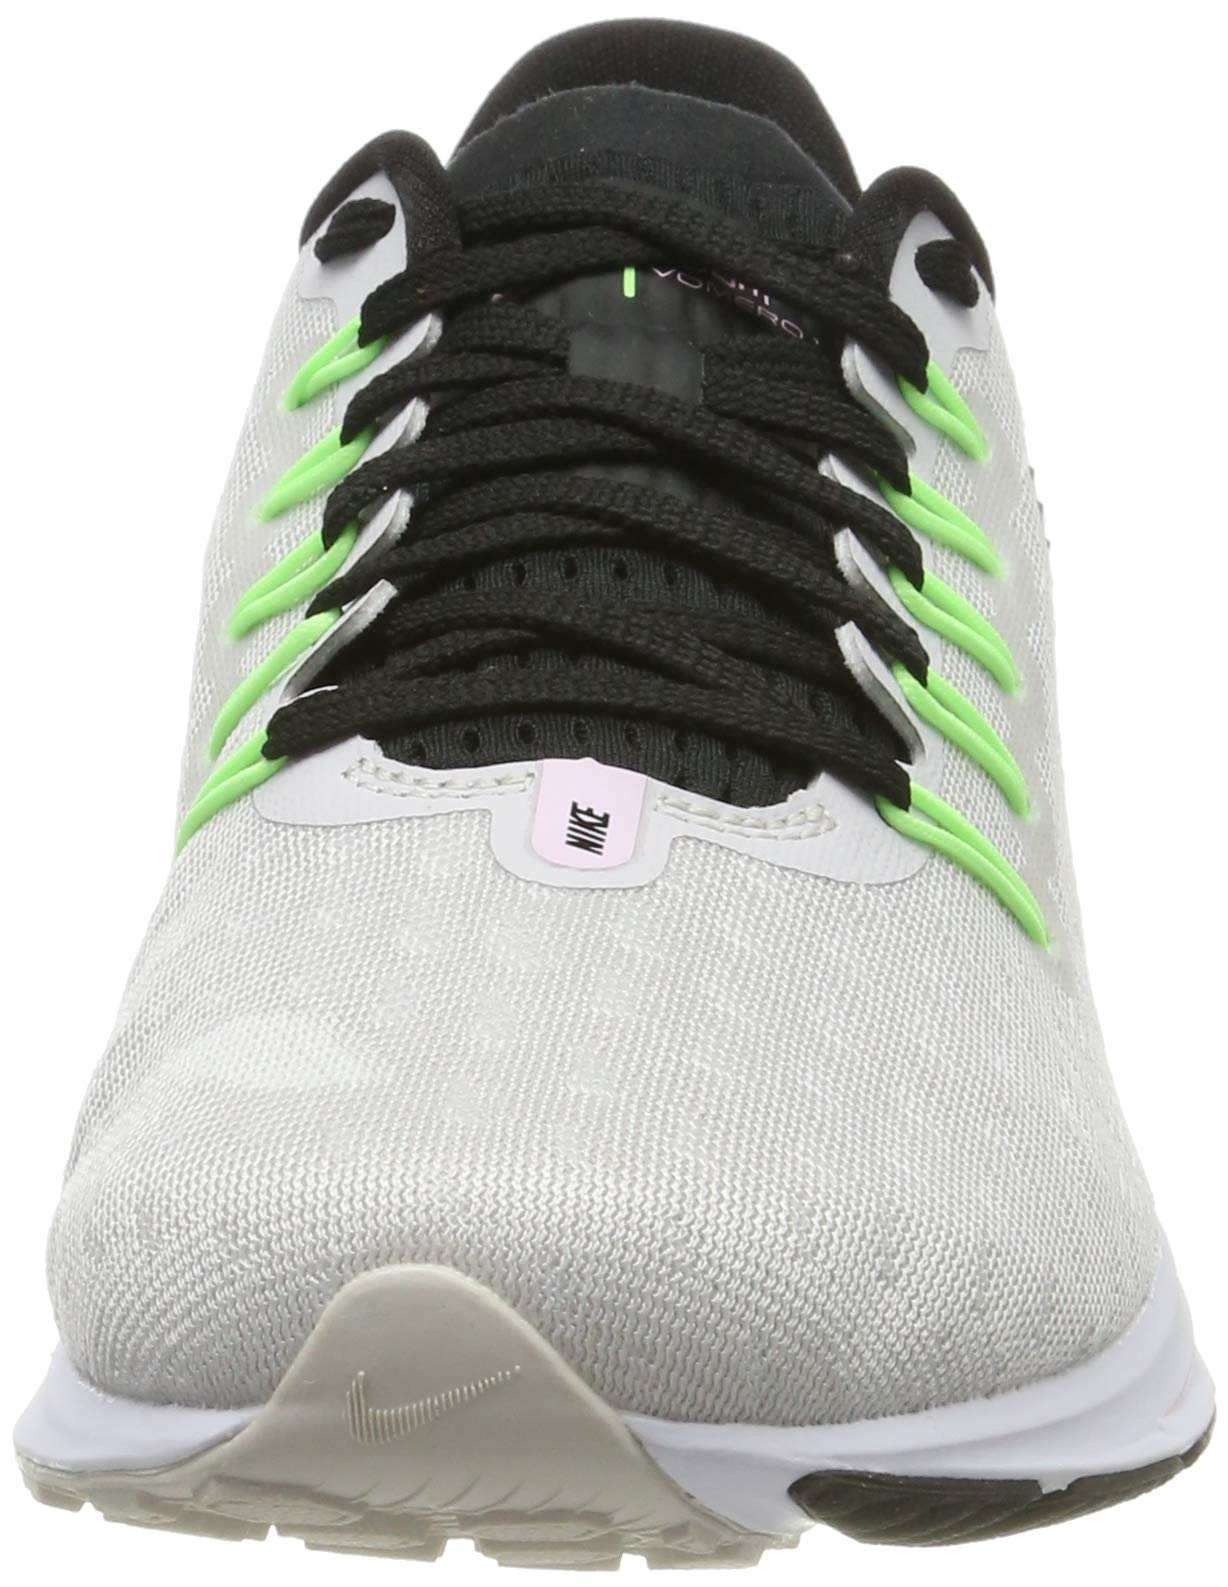 Nike Damen WMNS Air Zoom Vomero 14 Laufschuhe